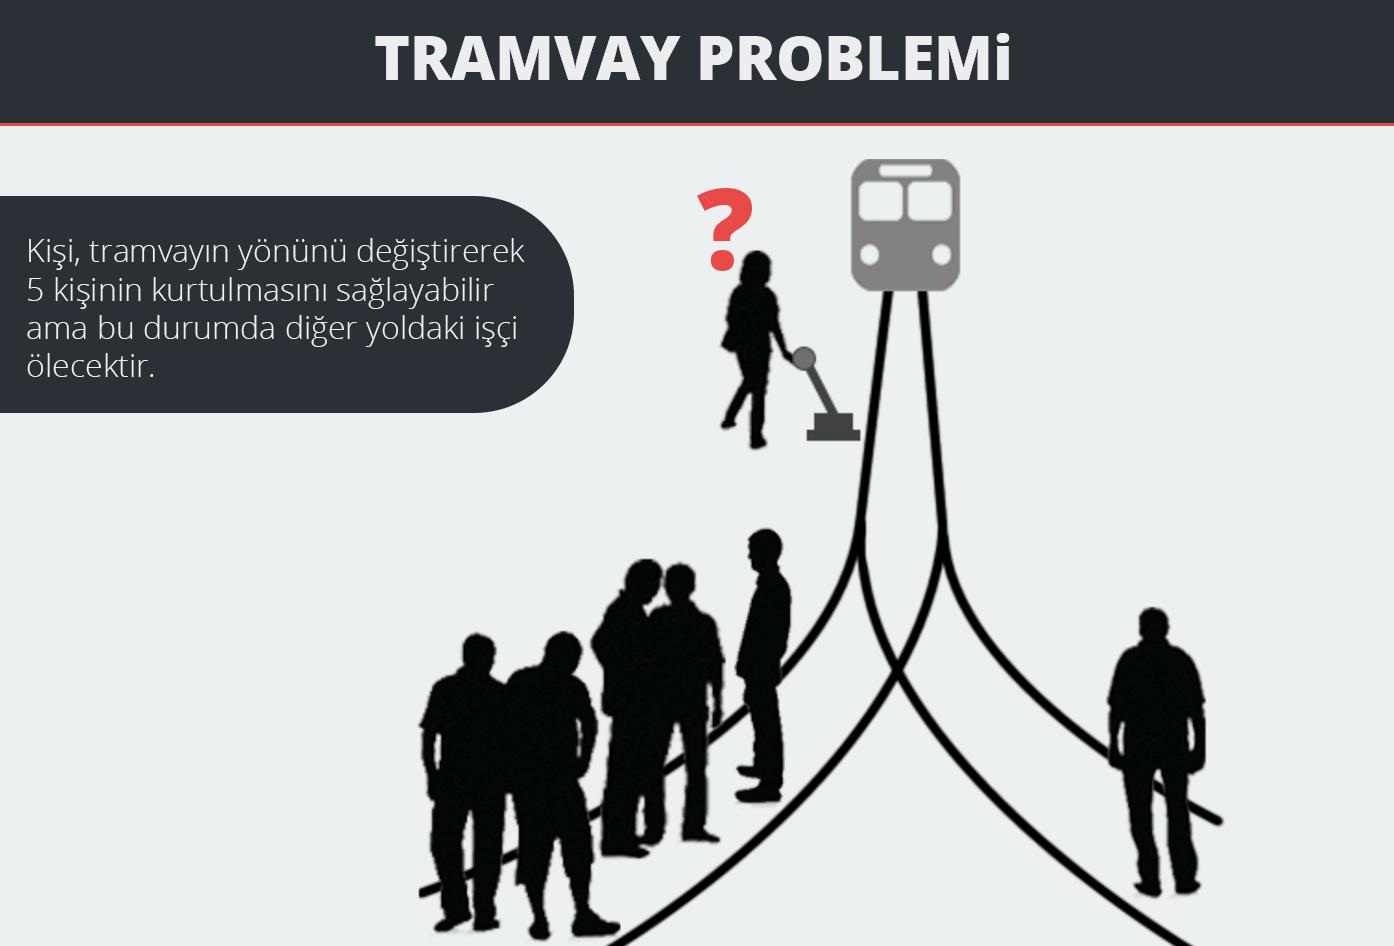 tramvay-problemi-bilimfilicom